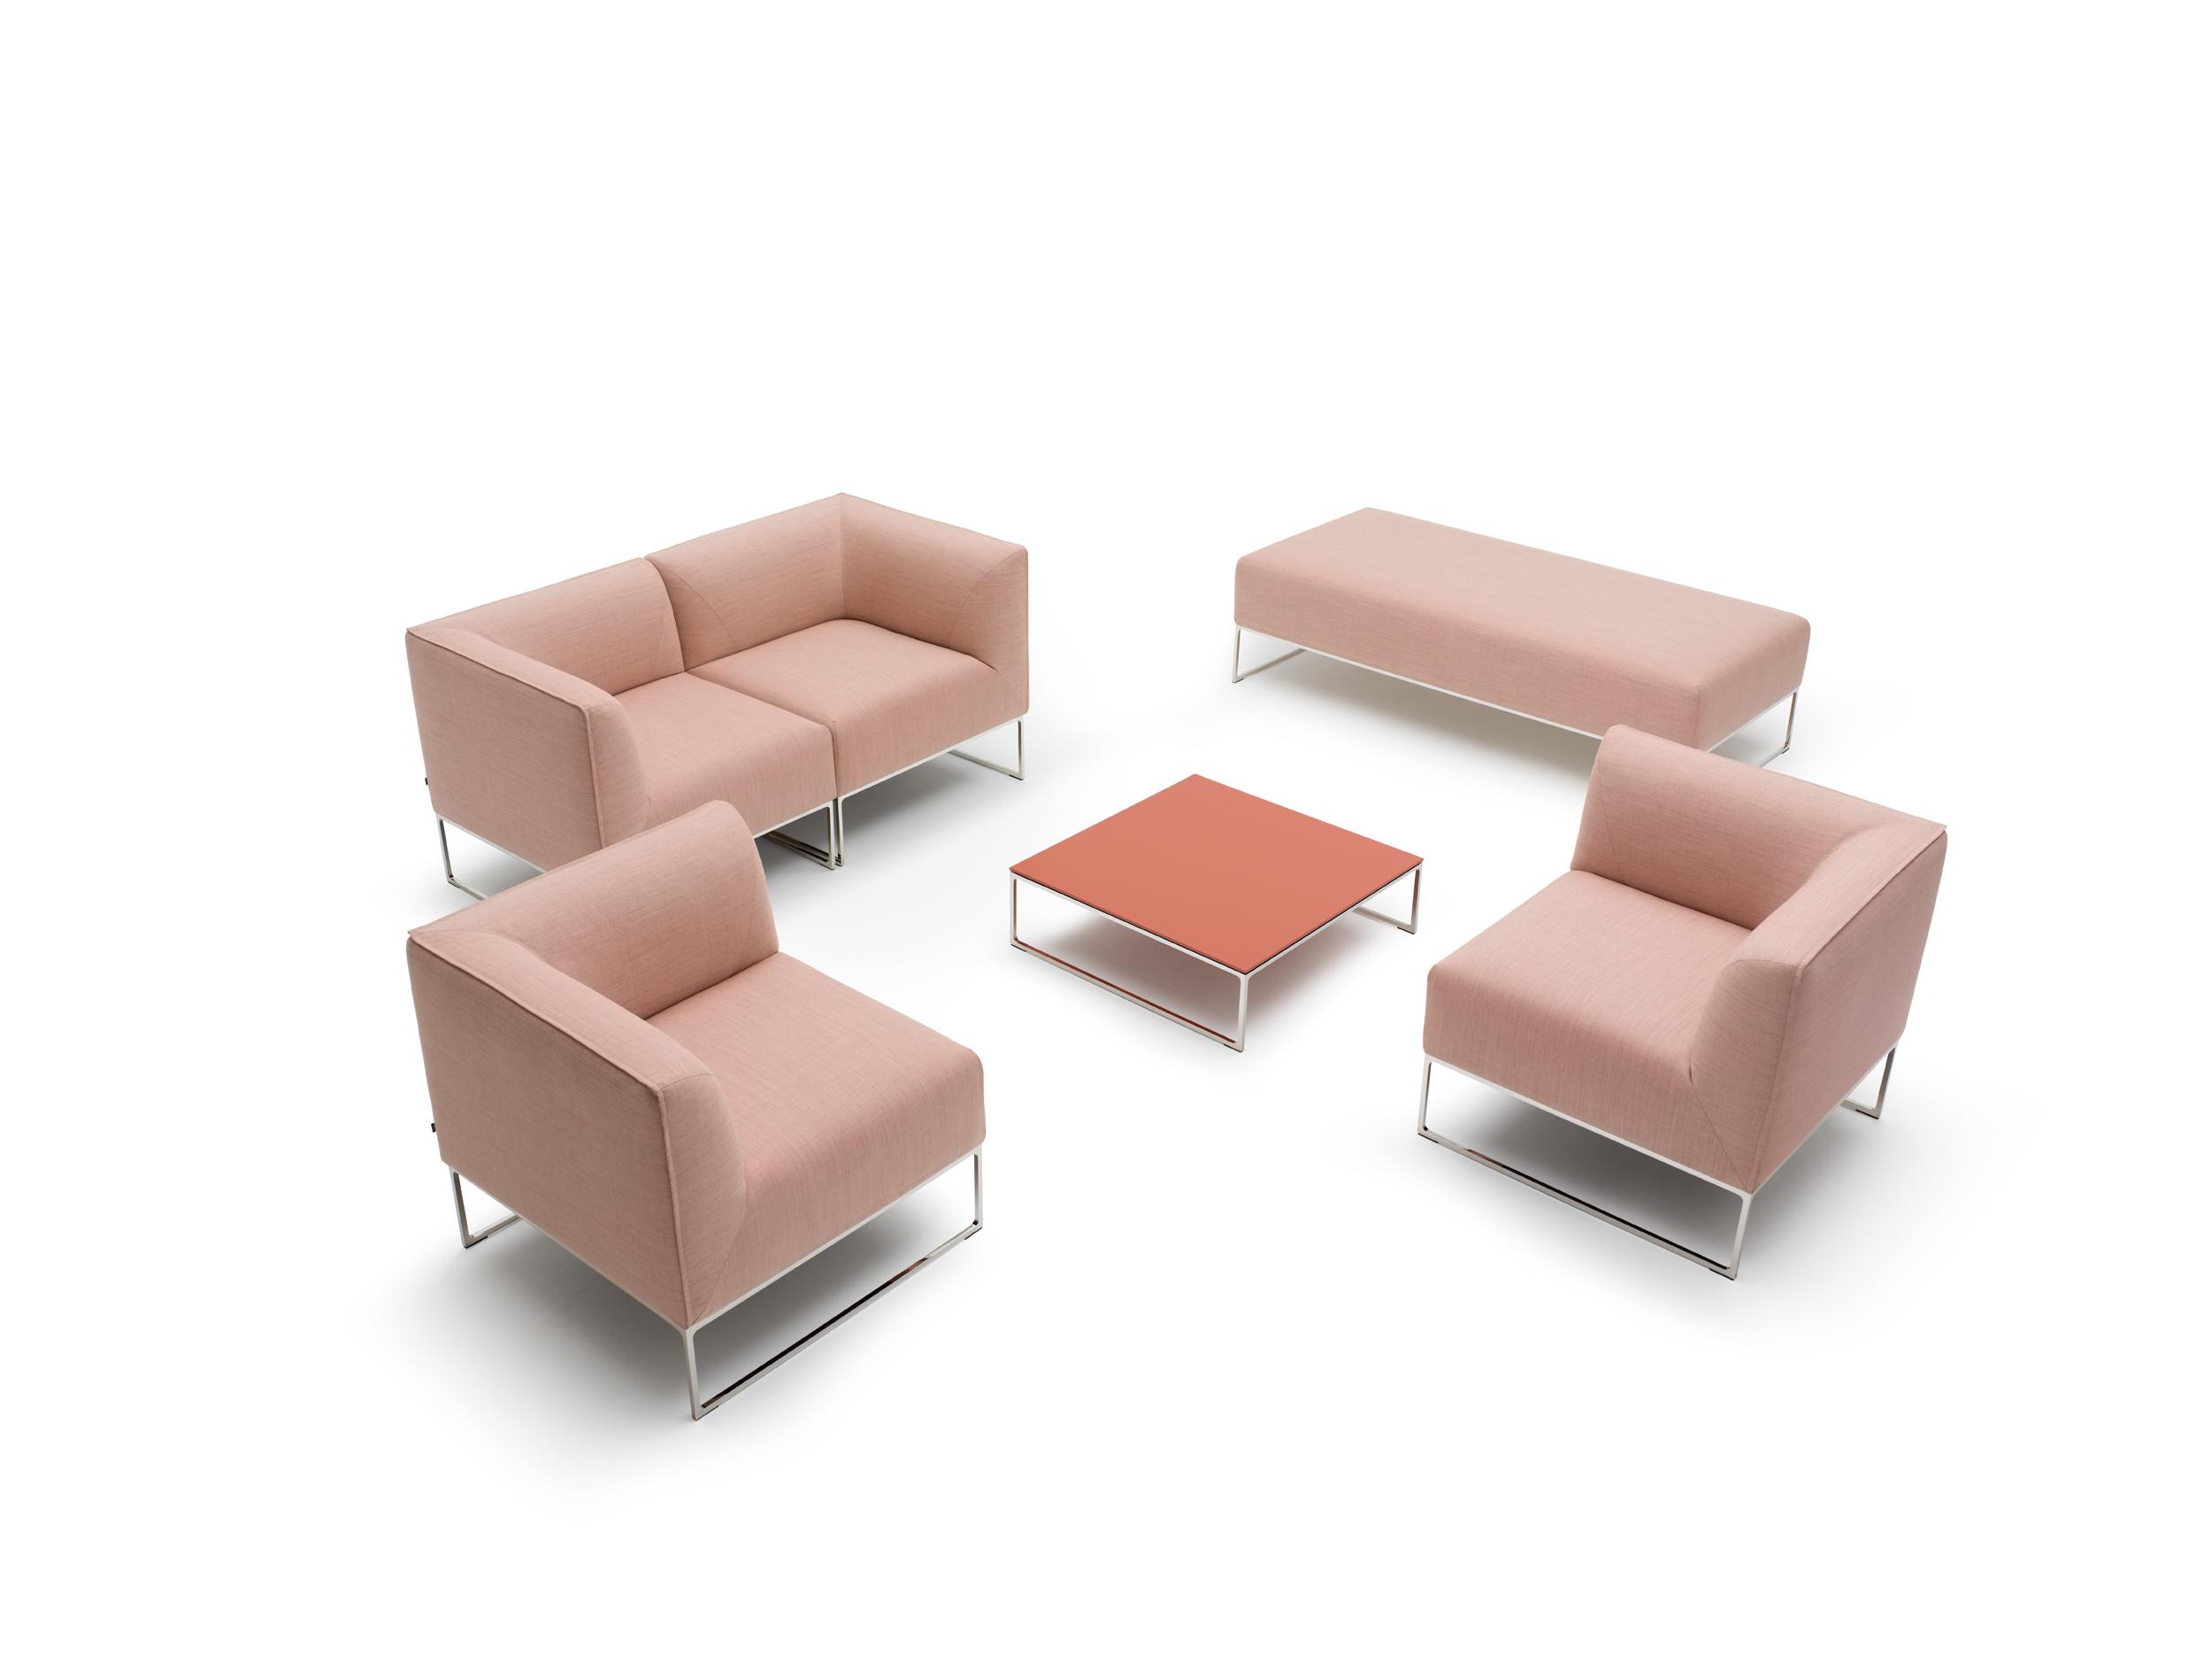 mell beistelltisch professional cor. Black Bedroom Furniture Sets. Home Design Ideas